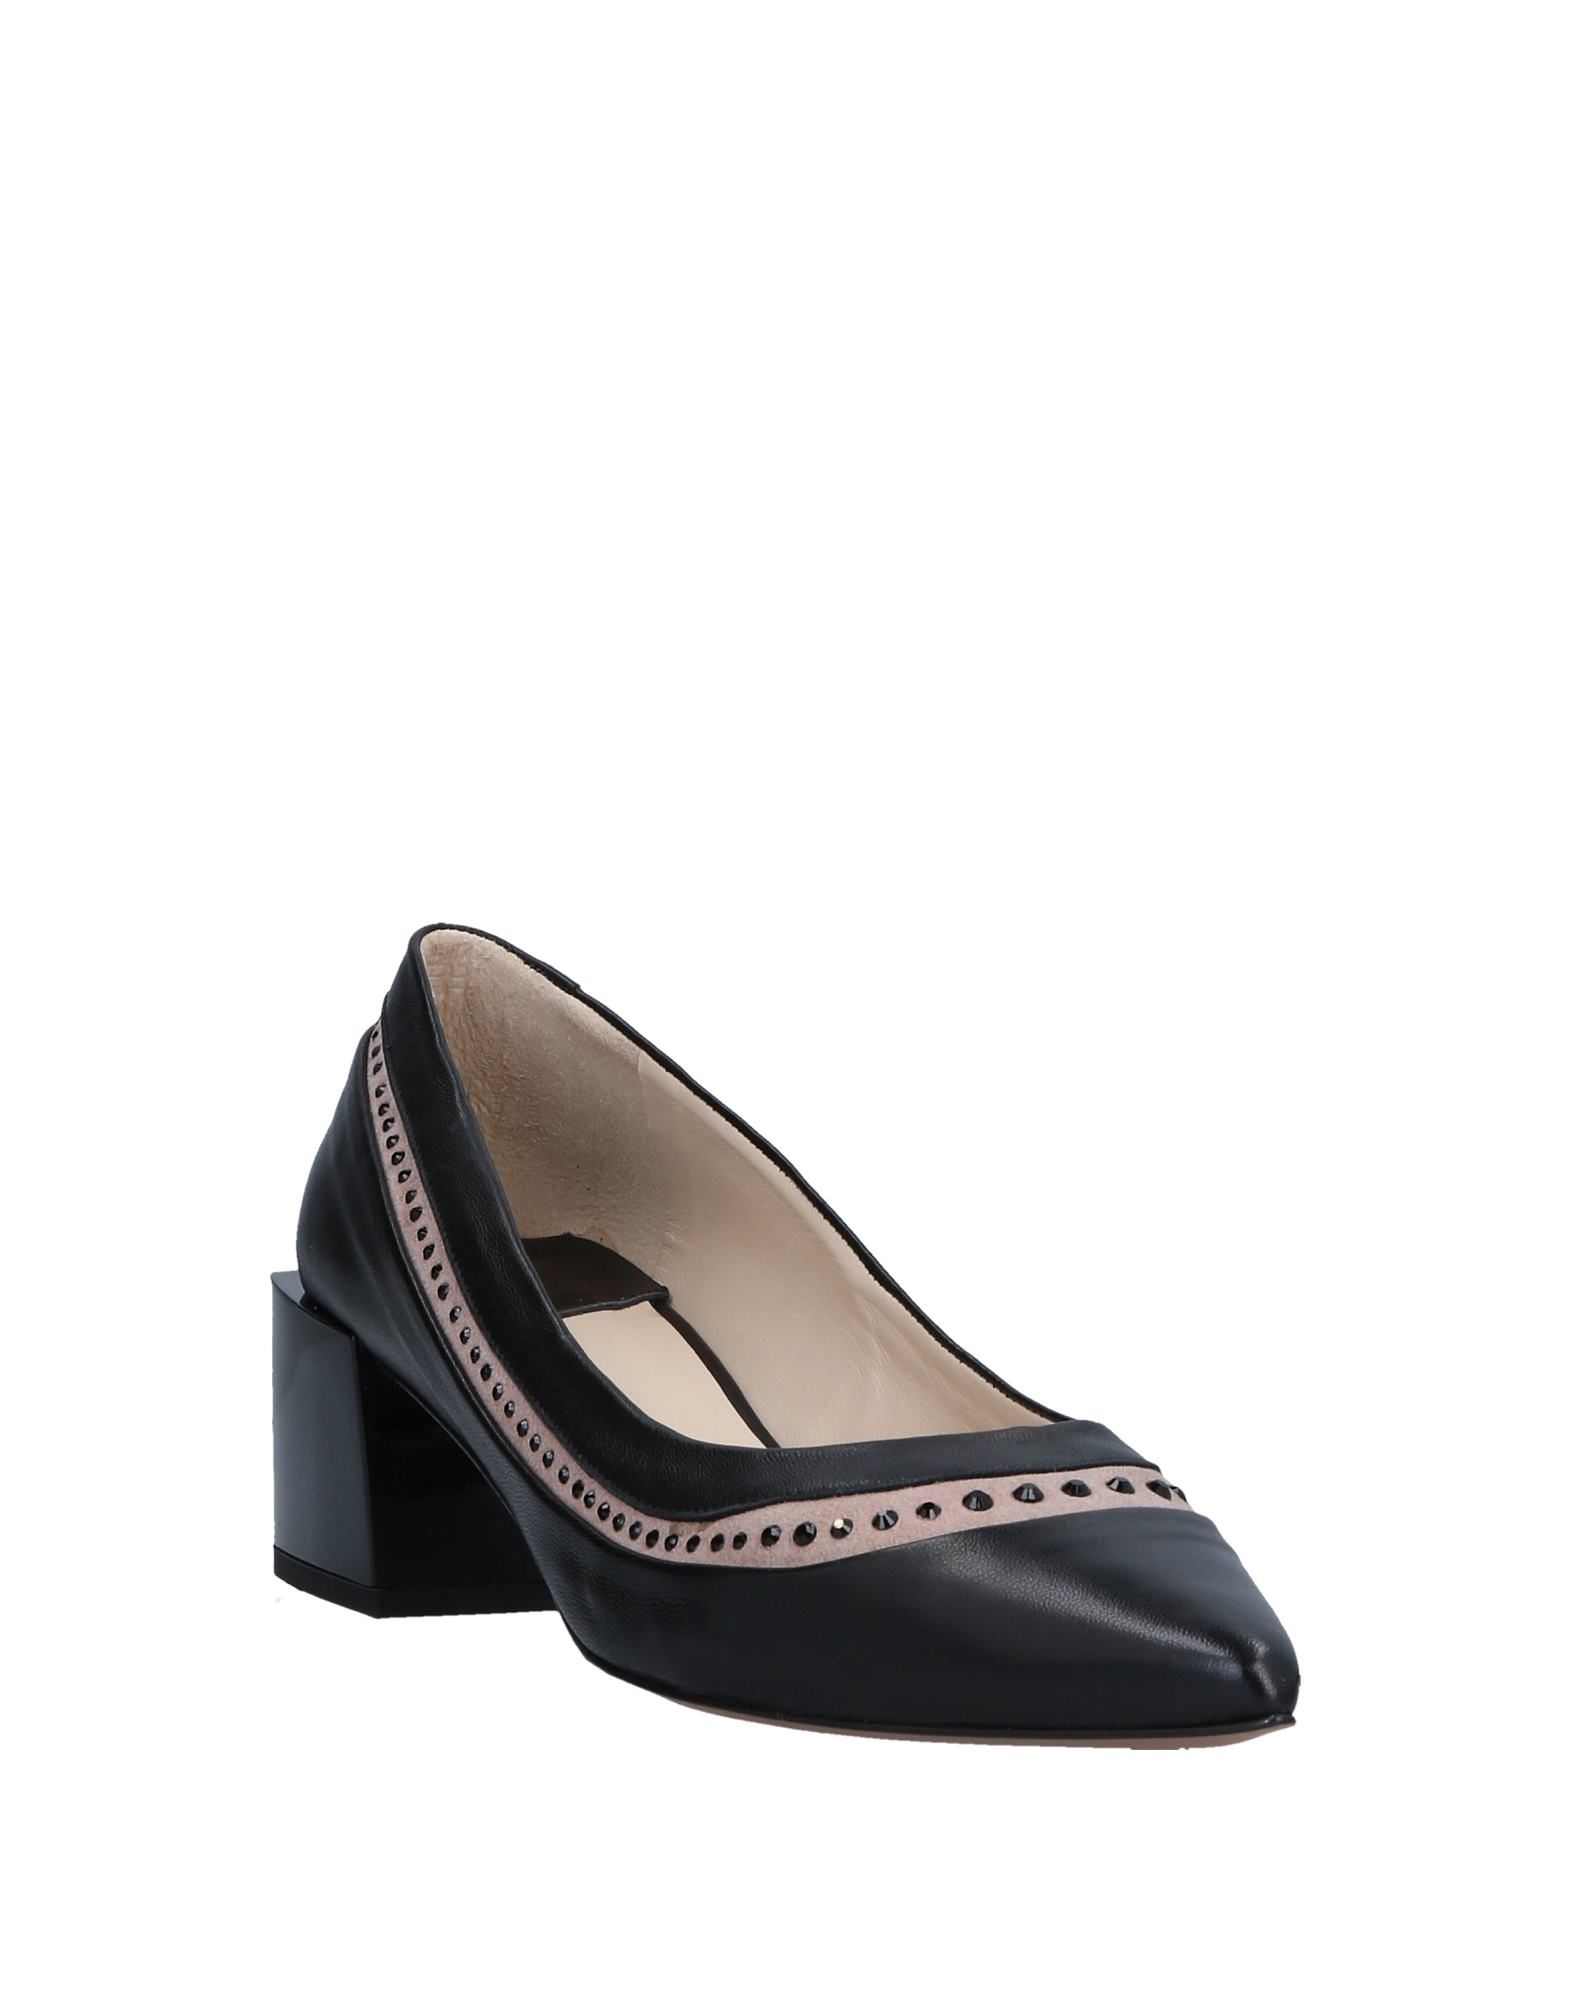 Leie Pumps Damen  11534145LS Gute Qualität beliebte Schuhe